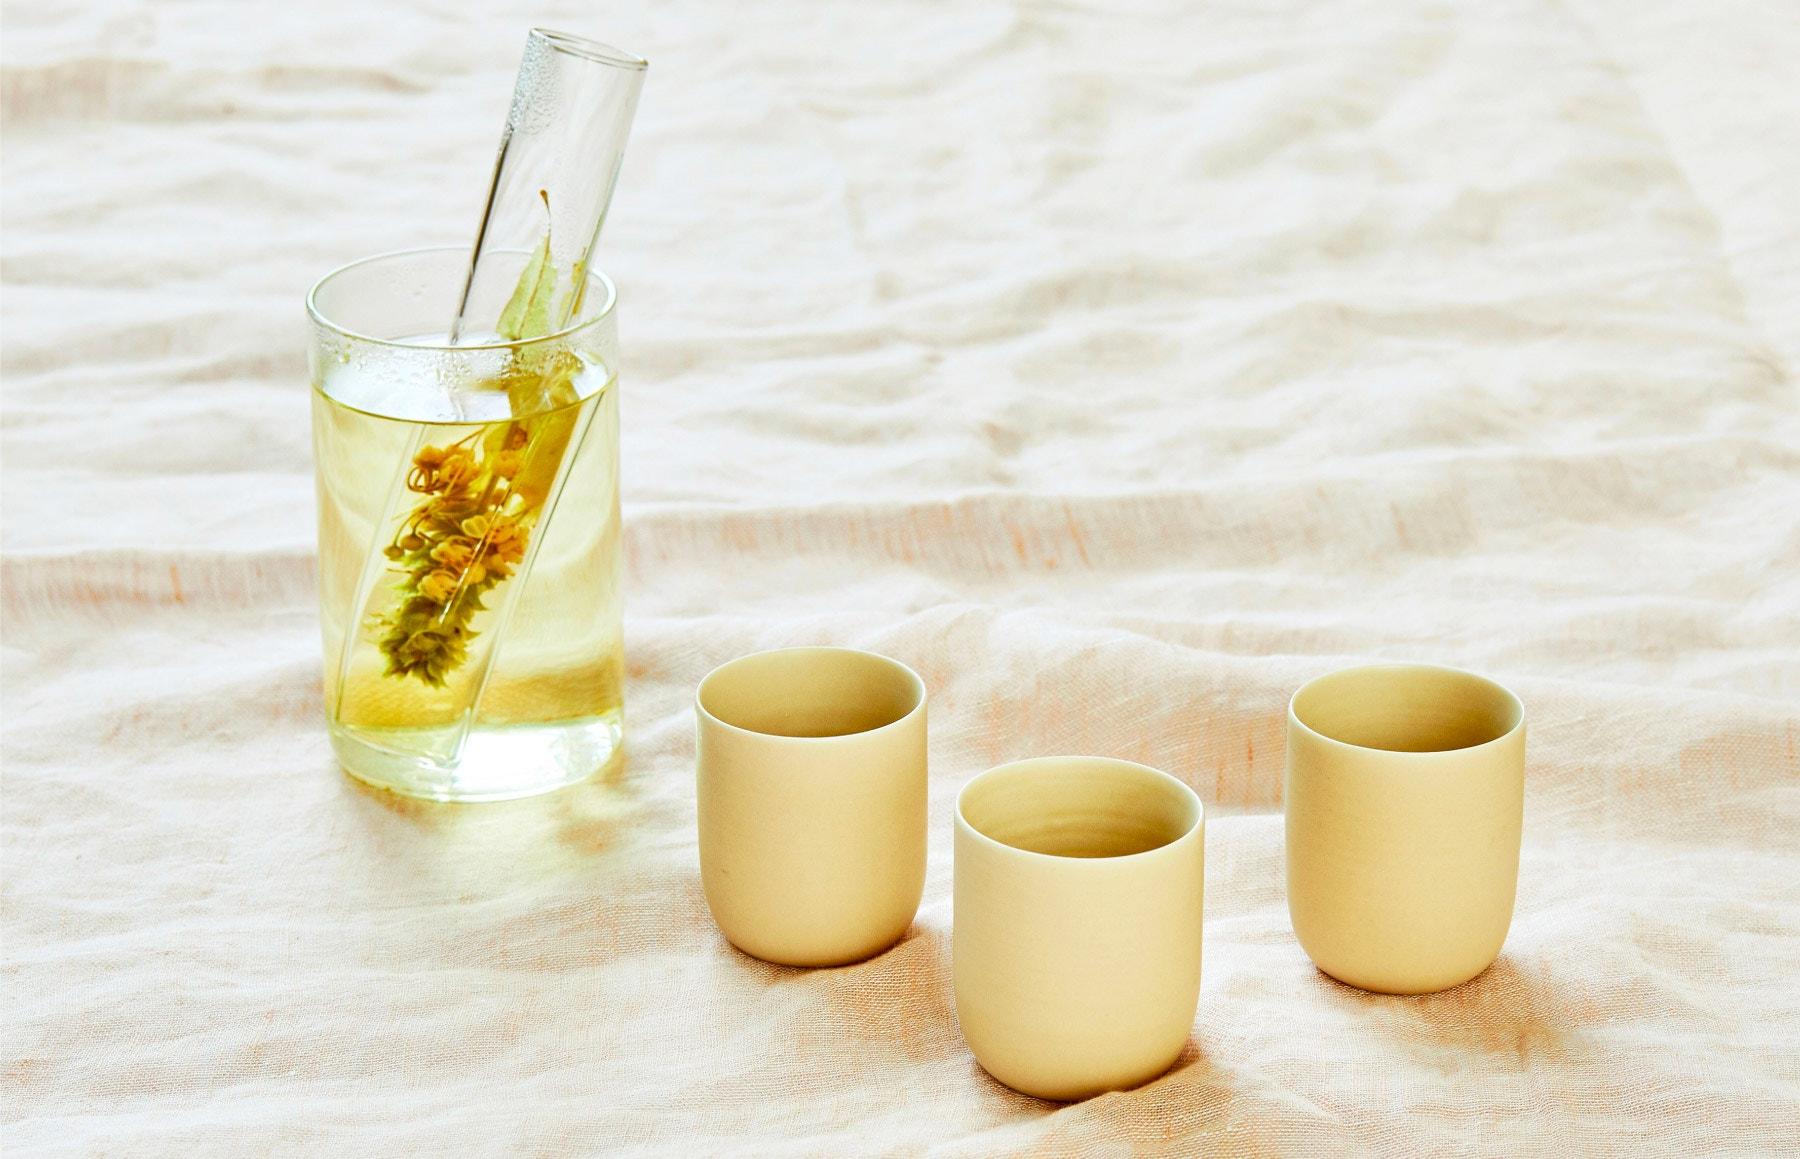 LAURENCE BRABANT Tea Ball Tea Tumbler – MAOMI Kaya Porcelain Espresso Cup